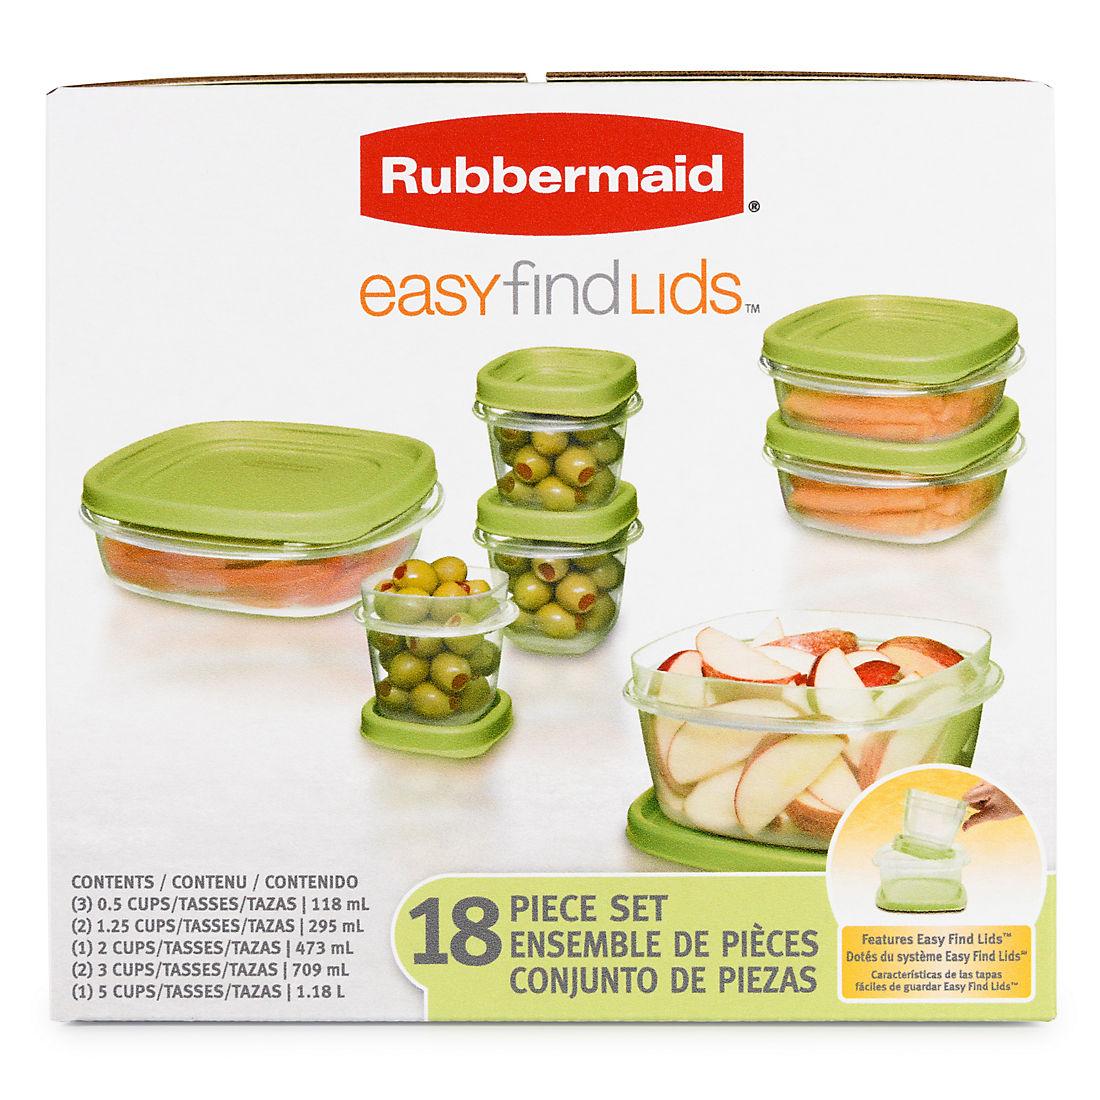 Rubbermaid Easy find Lids  18 pc.set